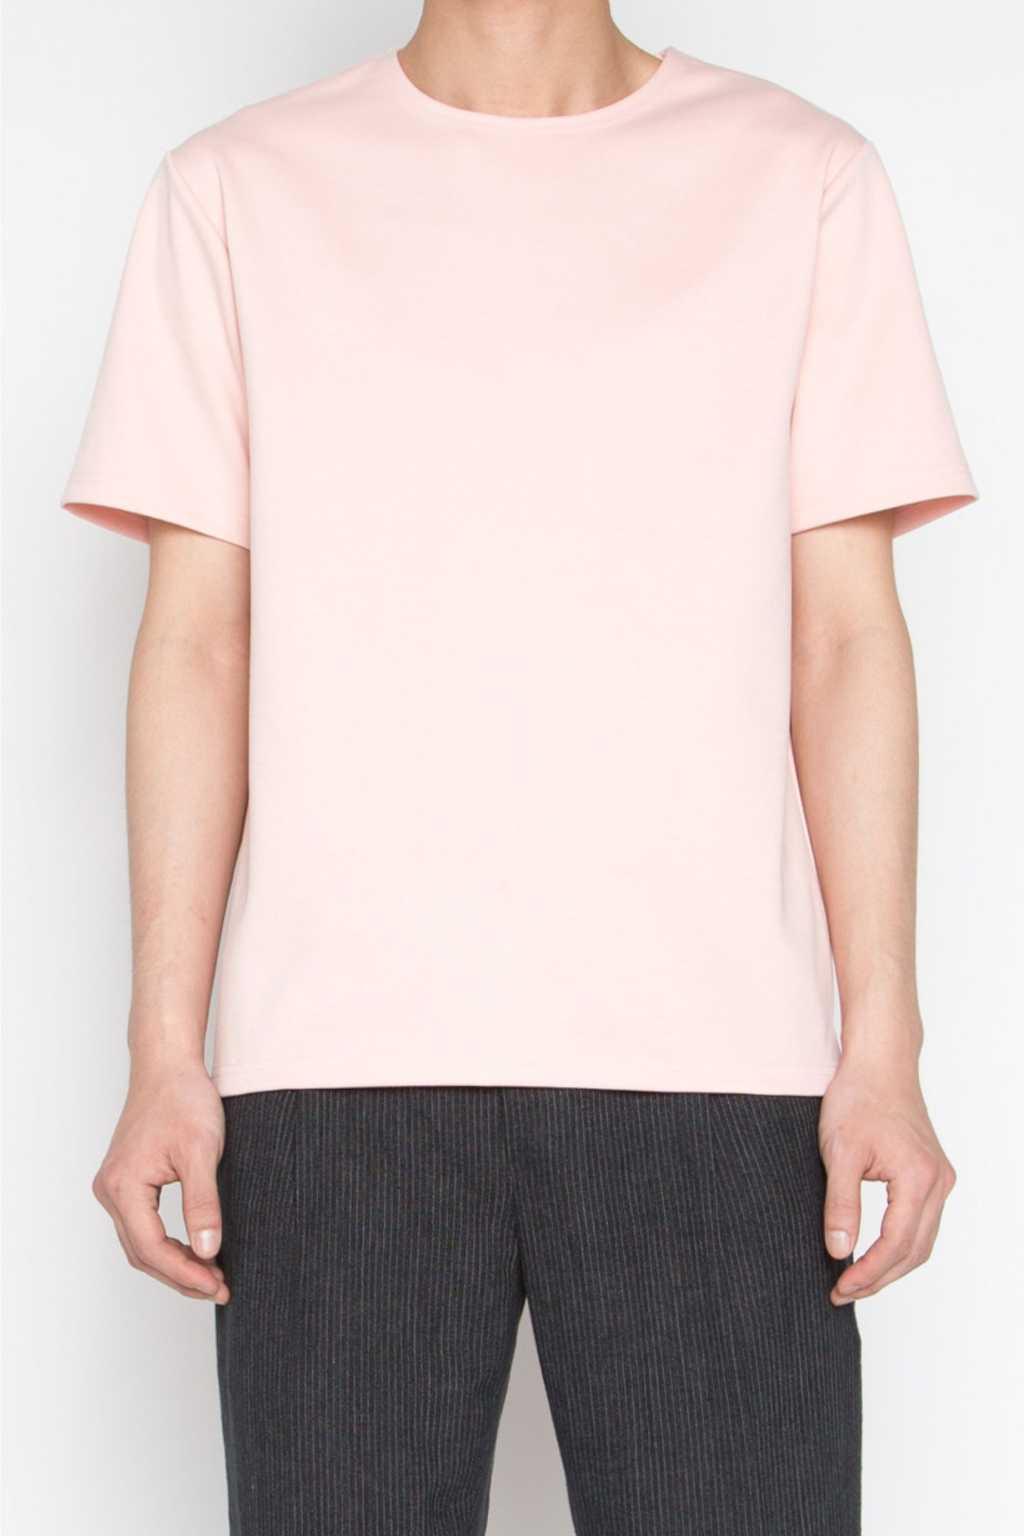 TShirt H031 Pink 2